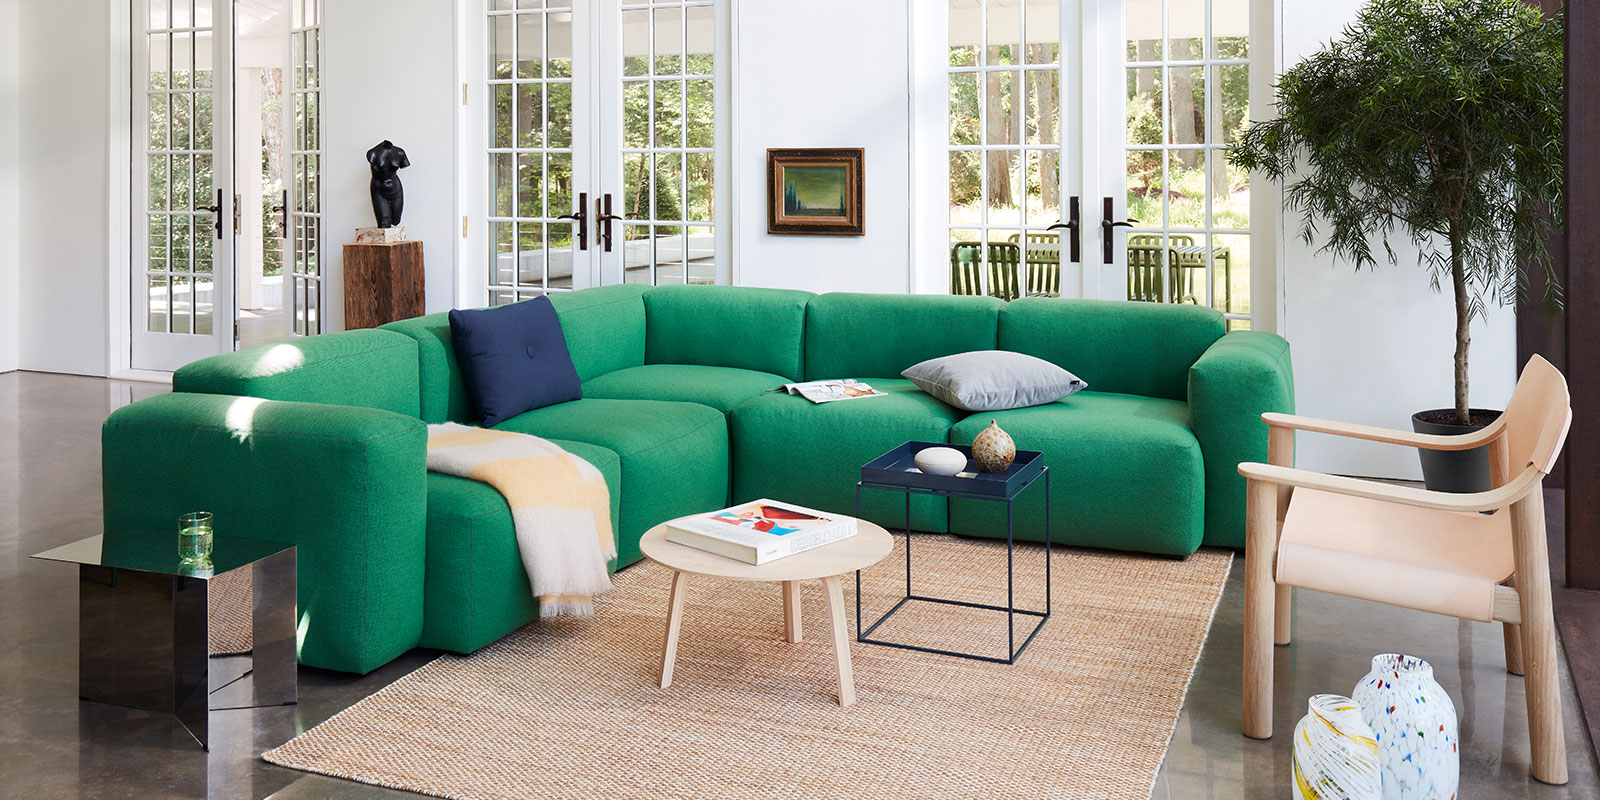 Papillon Interiors Sofas - HAY Mags Sofa